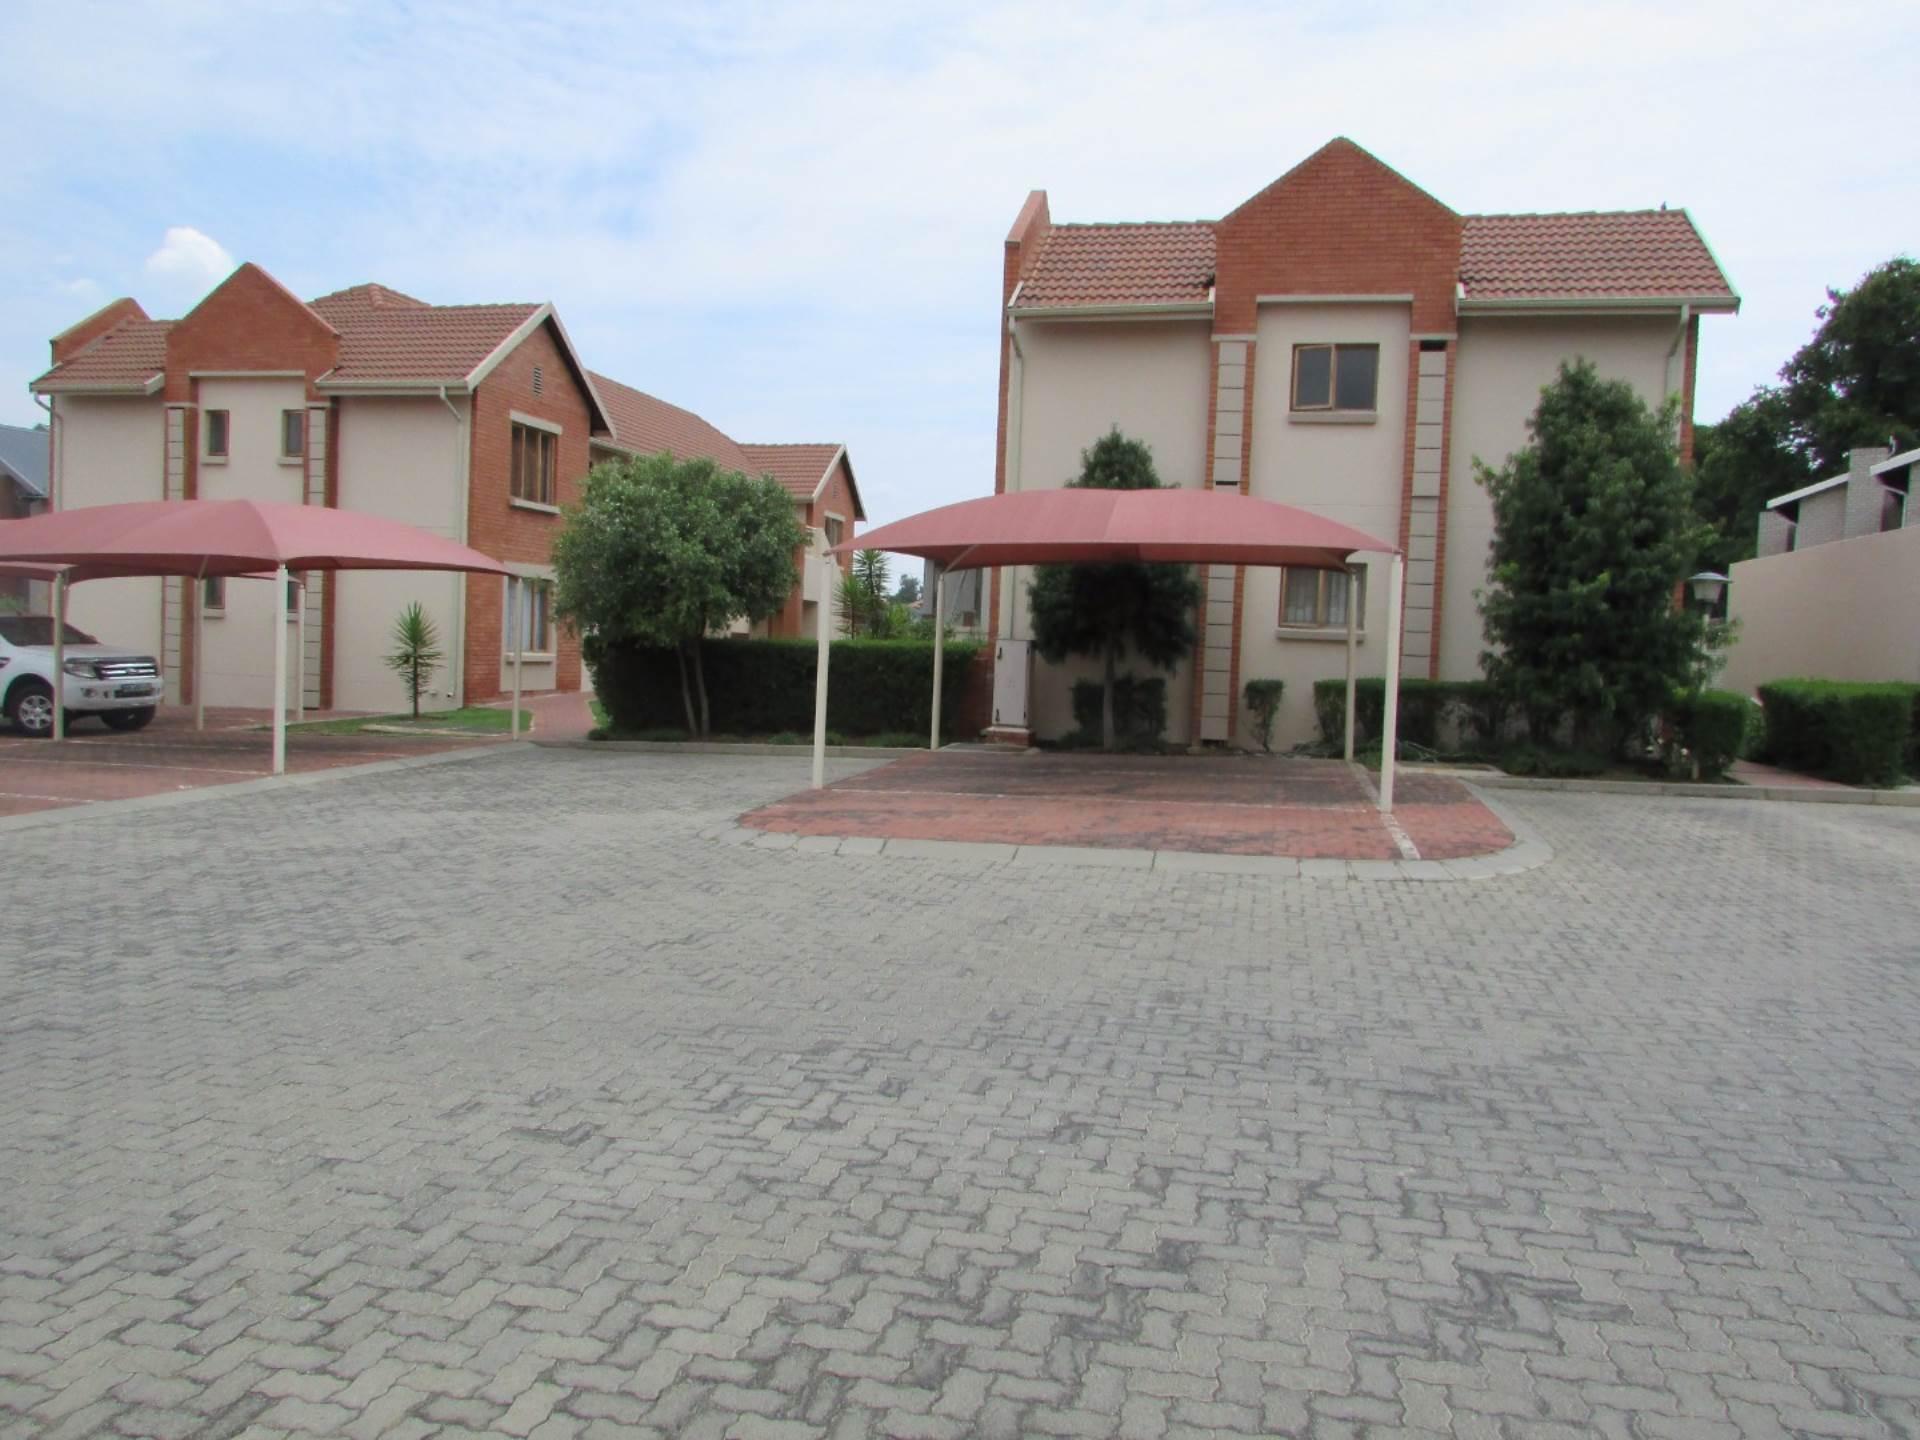 2 BedroomTownhouse For Sale In Atlasville